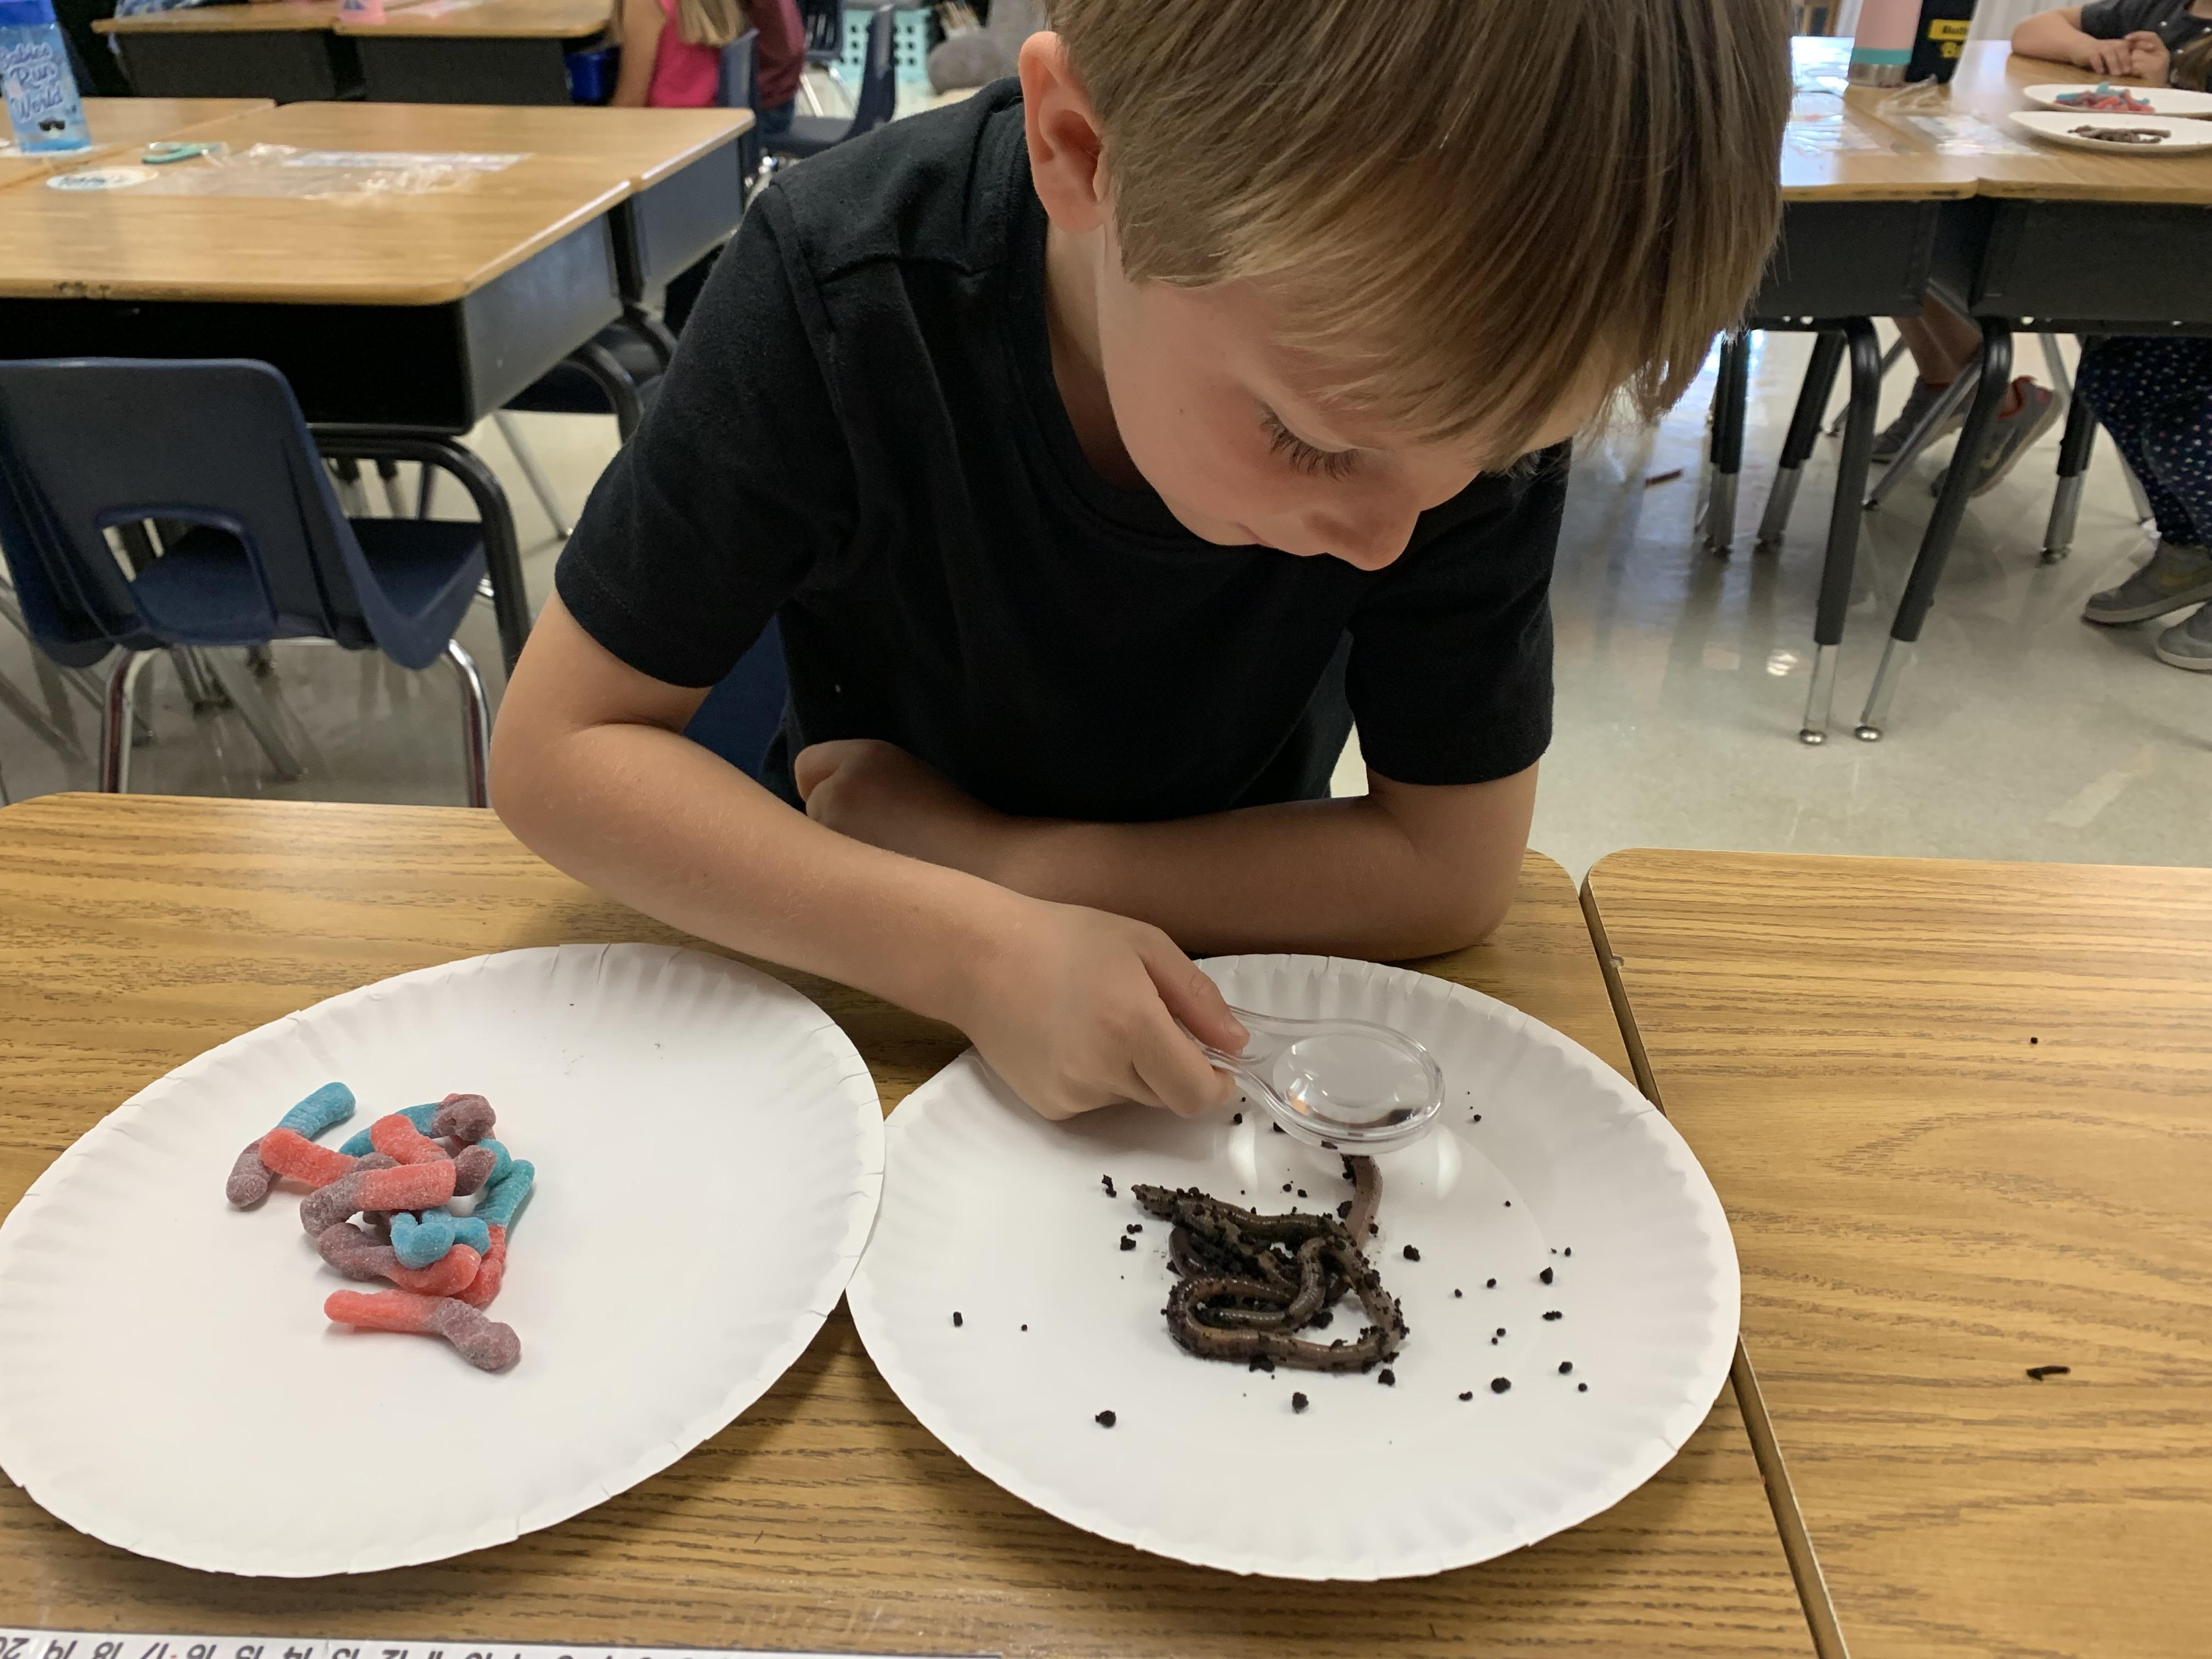 Worm experiment